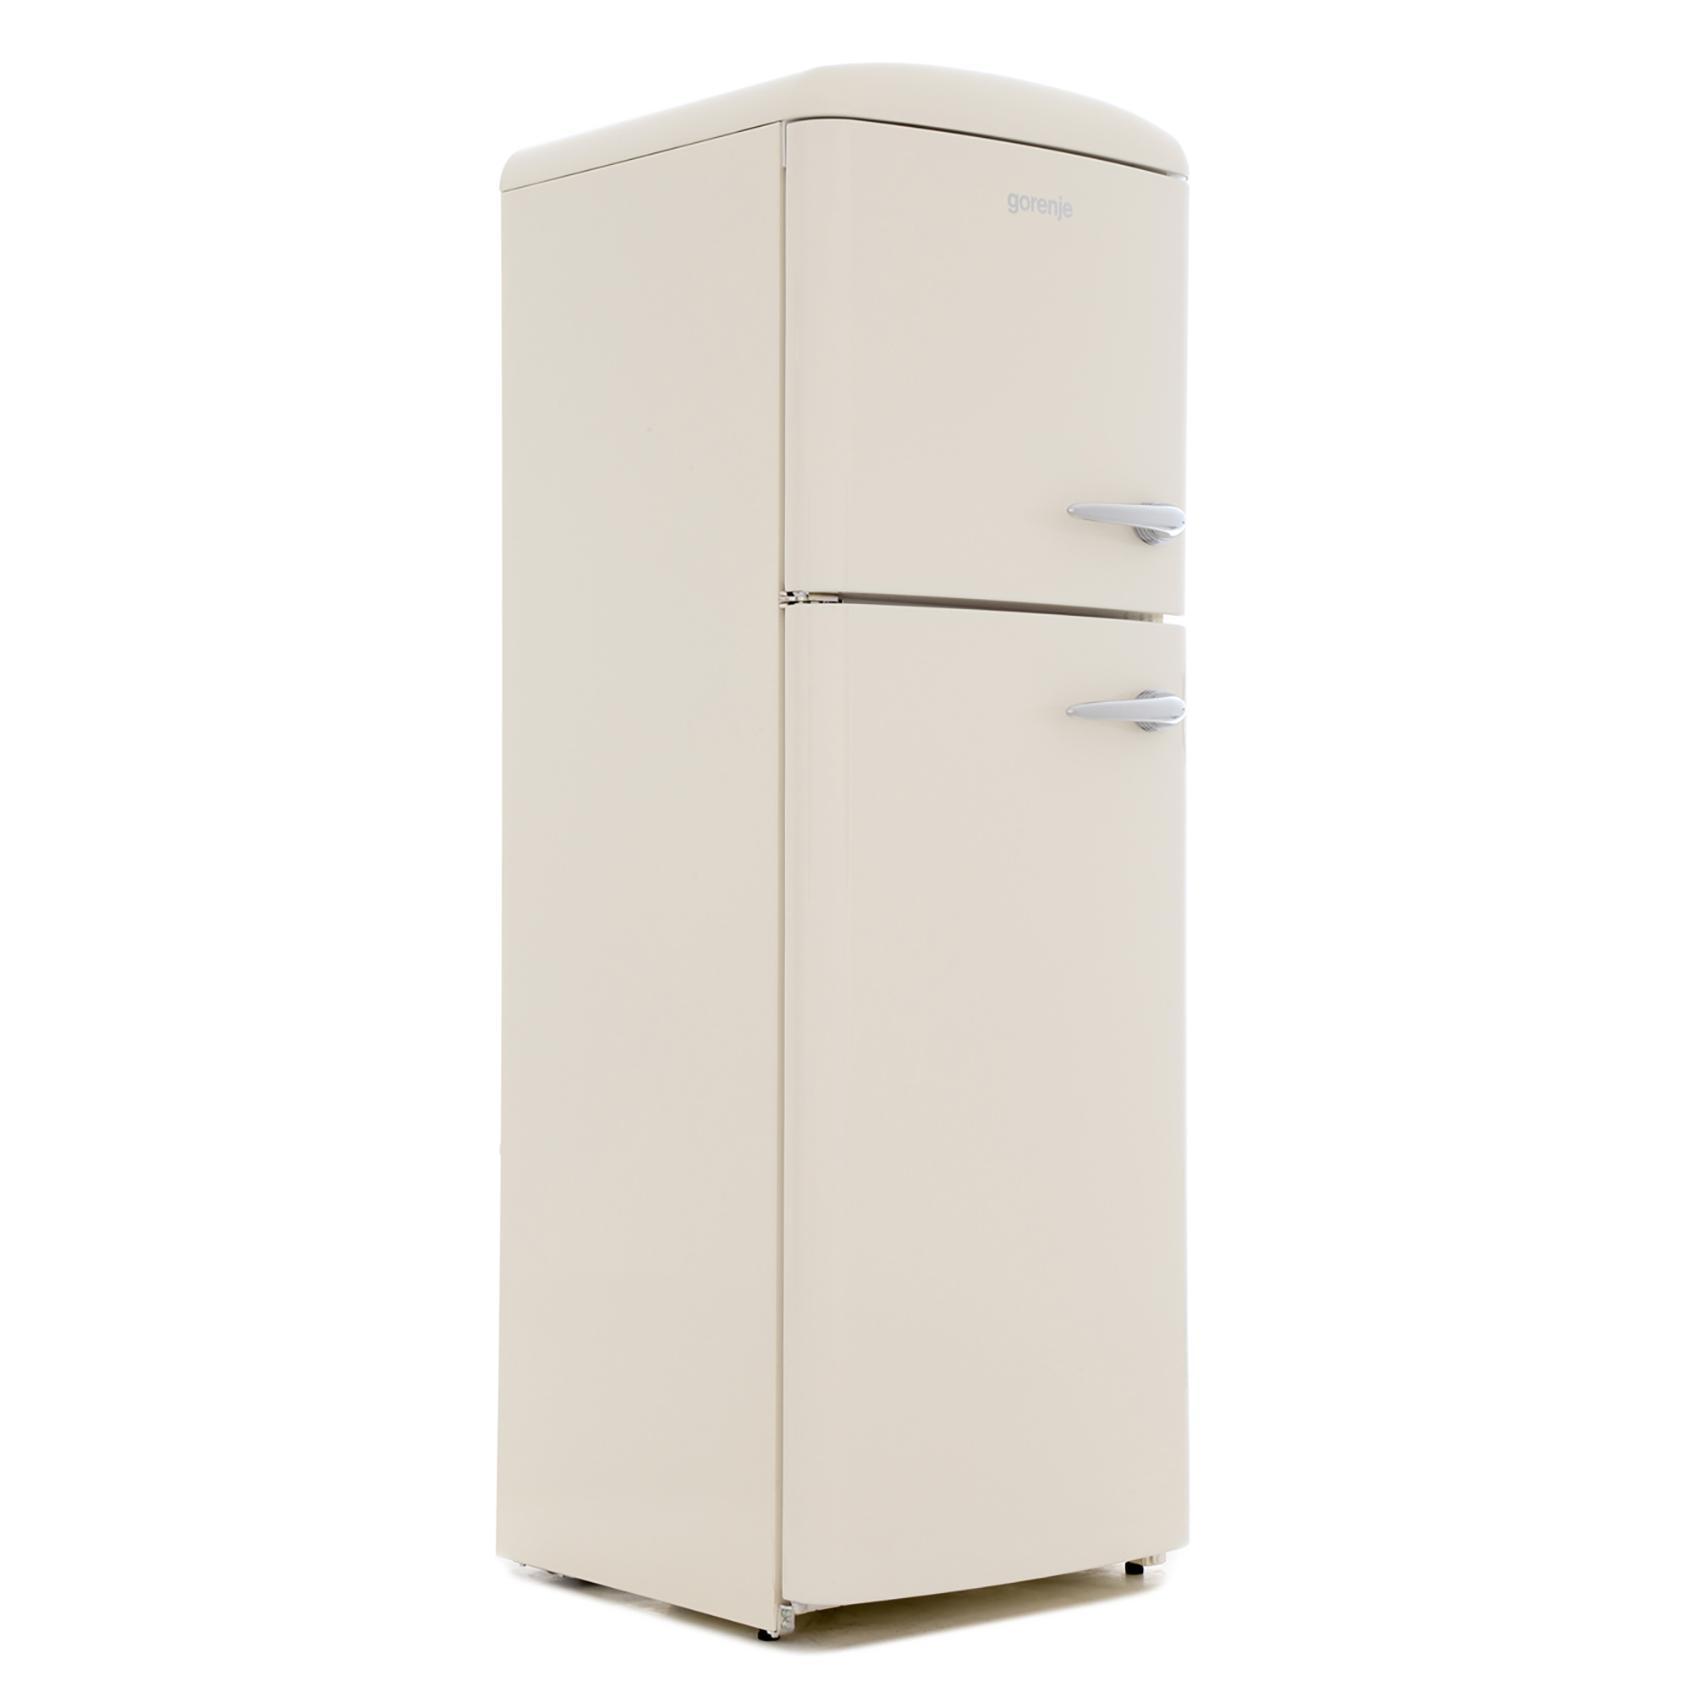 Gorenje RF60309OCL Retro Static Fridge Freezer